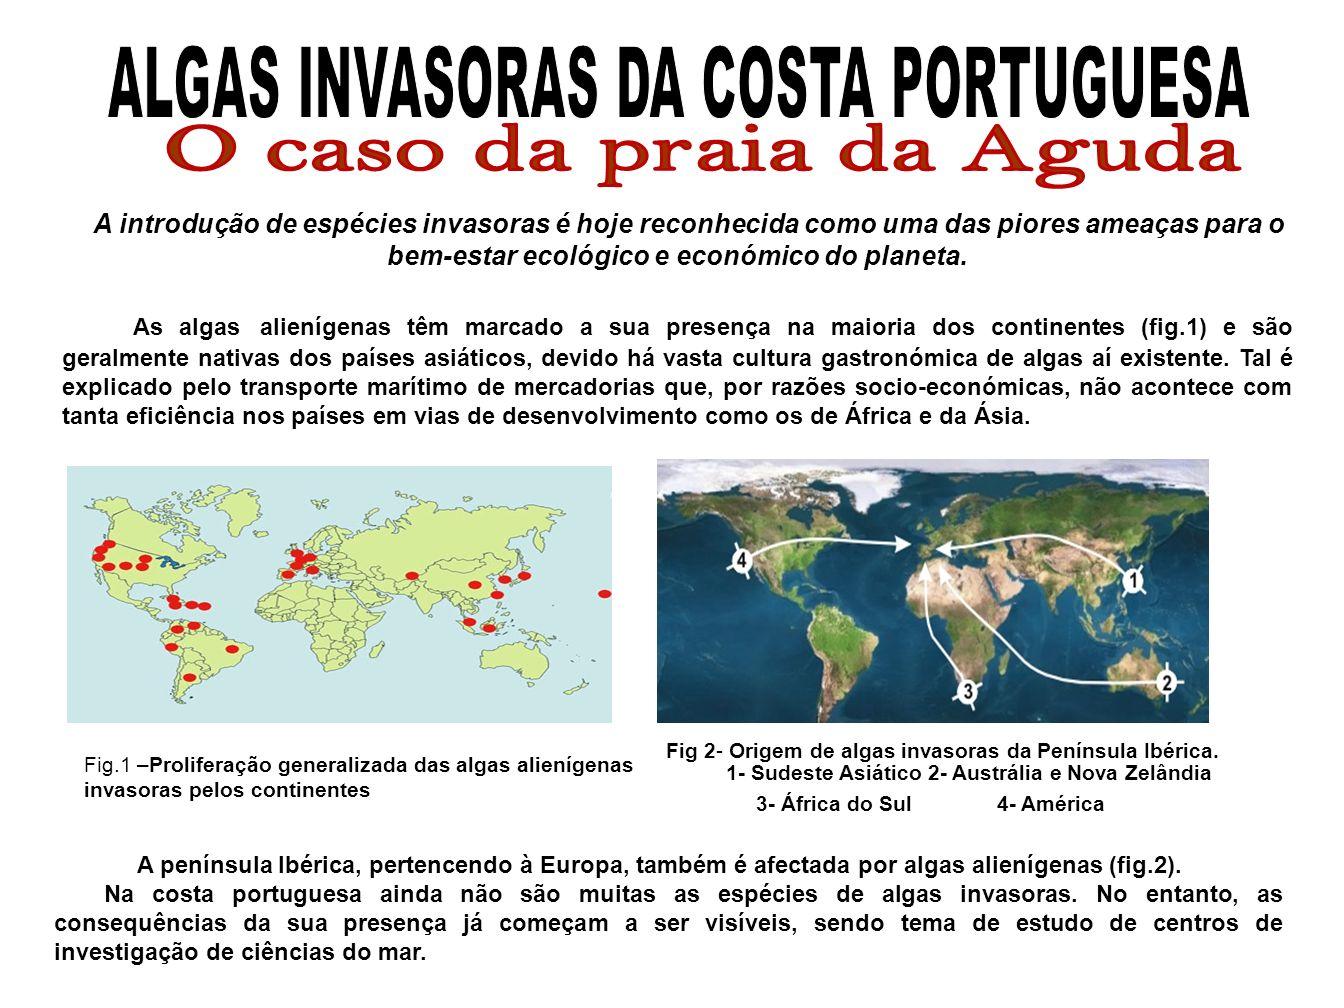 ALGAS INVASORAS DA COSTA PORTUGUESA